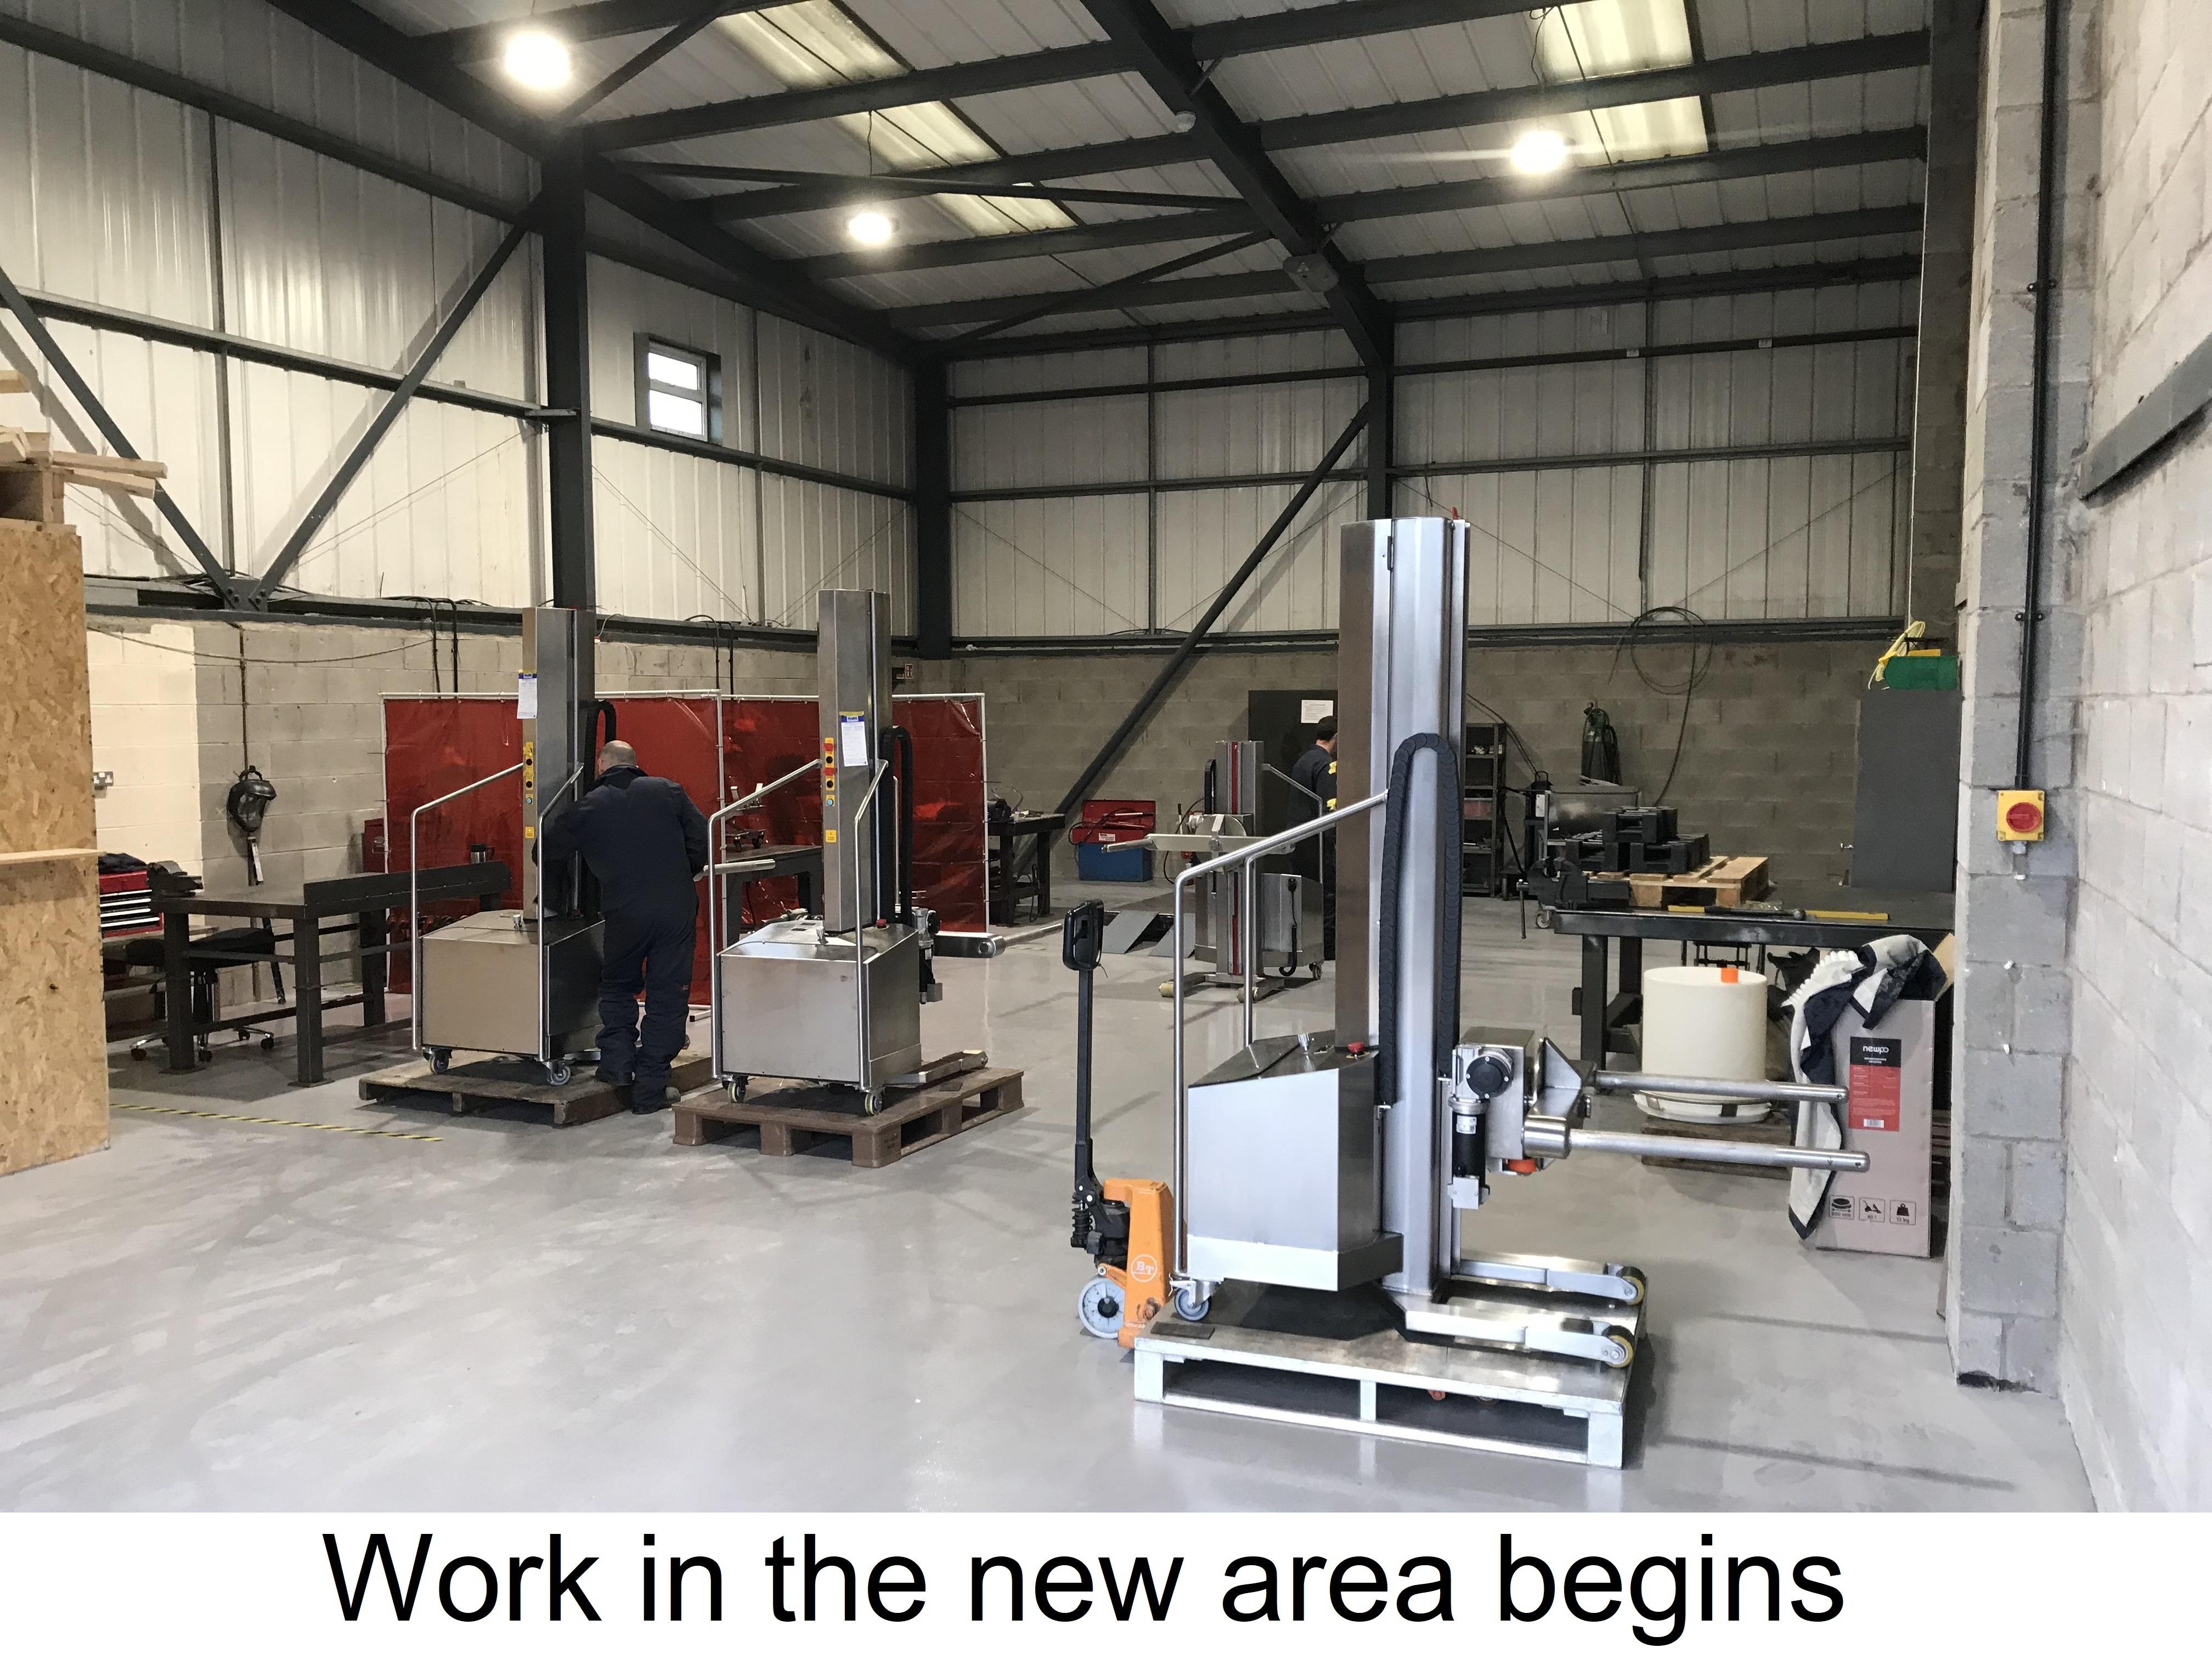 https://0201.nccdn.net/1_2/000/000/0f8/9b2/11.-work-in-the-new-unit-begins.jpg